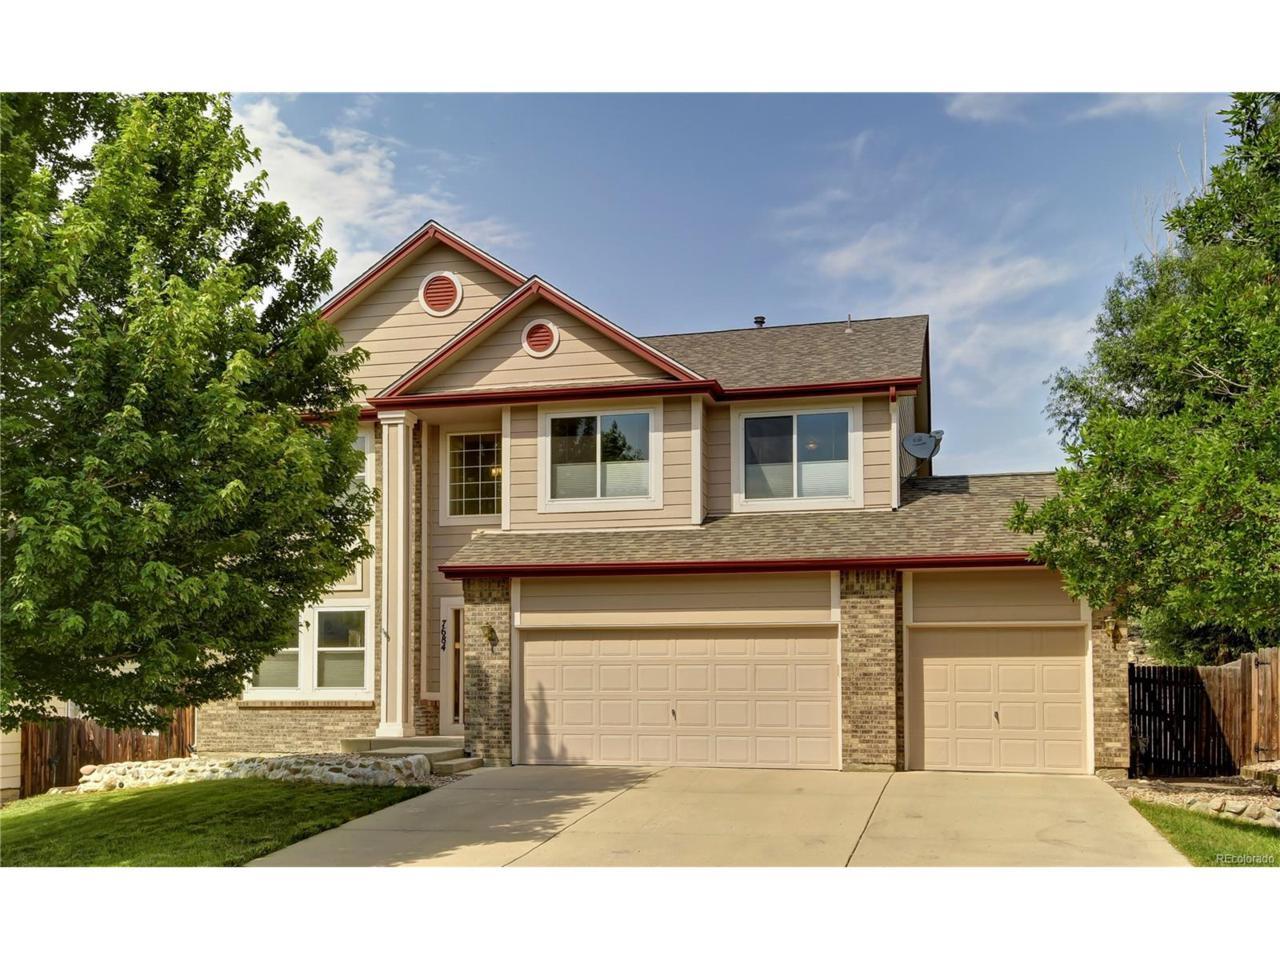 7684 Rampart Way, Littleton, CO 80125 (MLS #9250597) :: 8z Real Estate